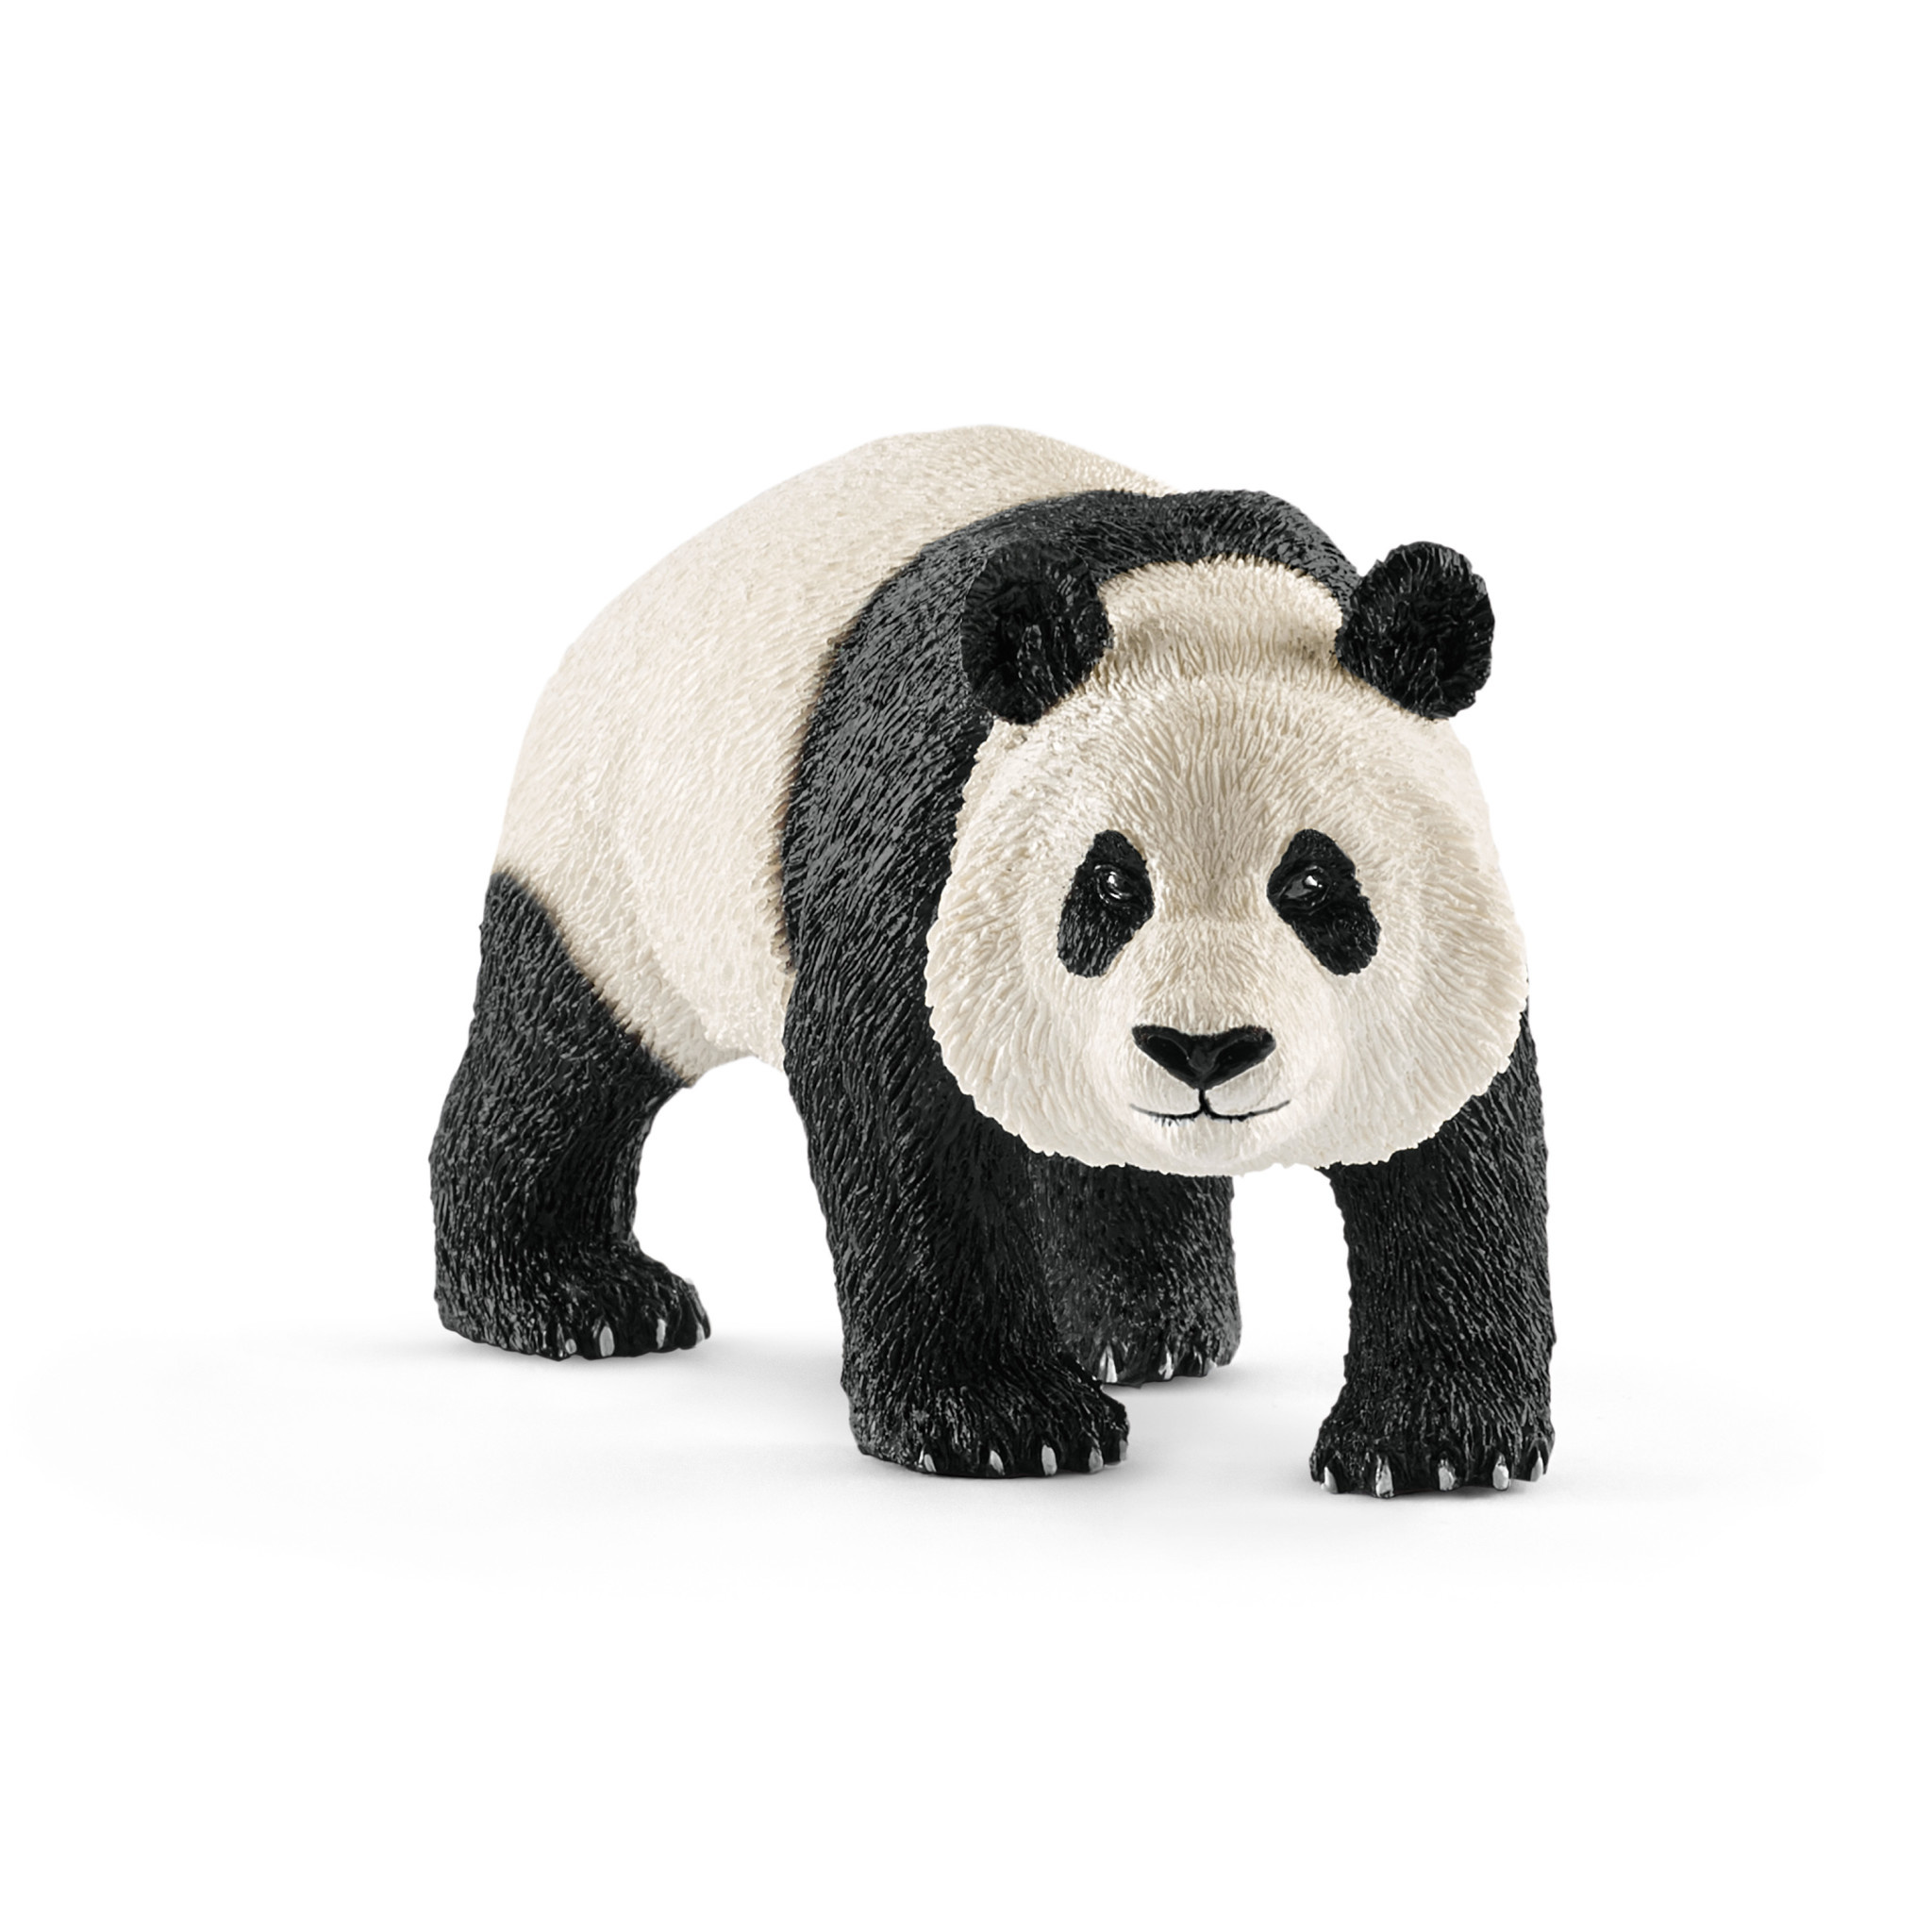 Giant Panda, Male, Figure by Schleich